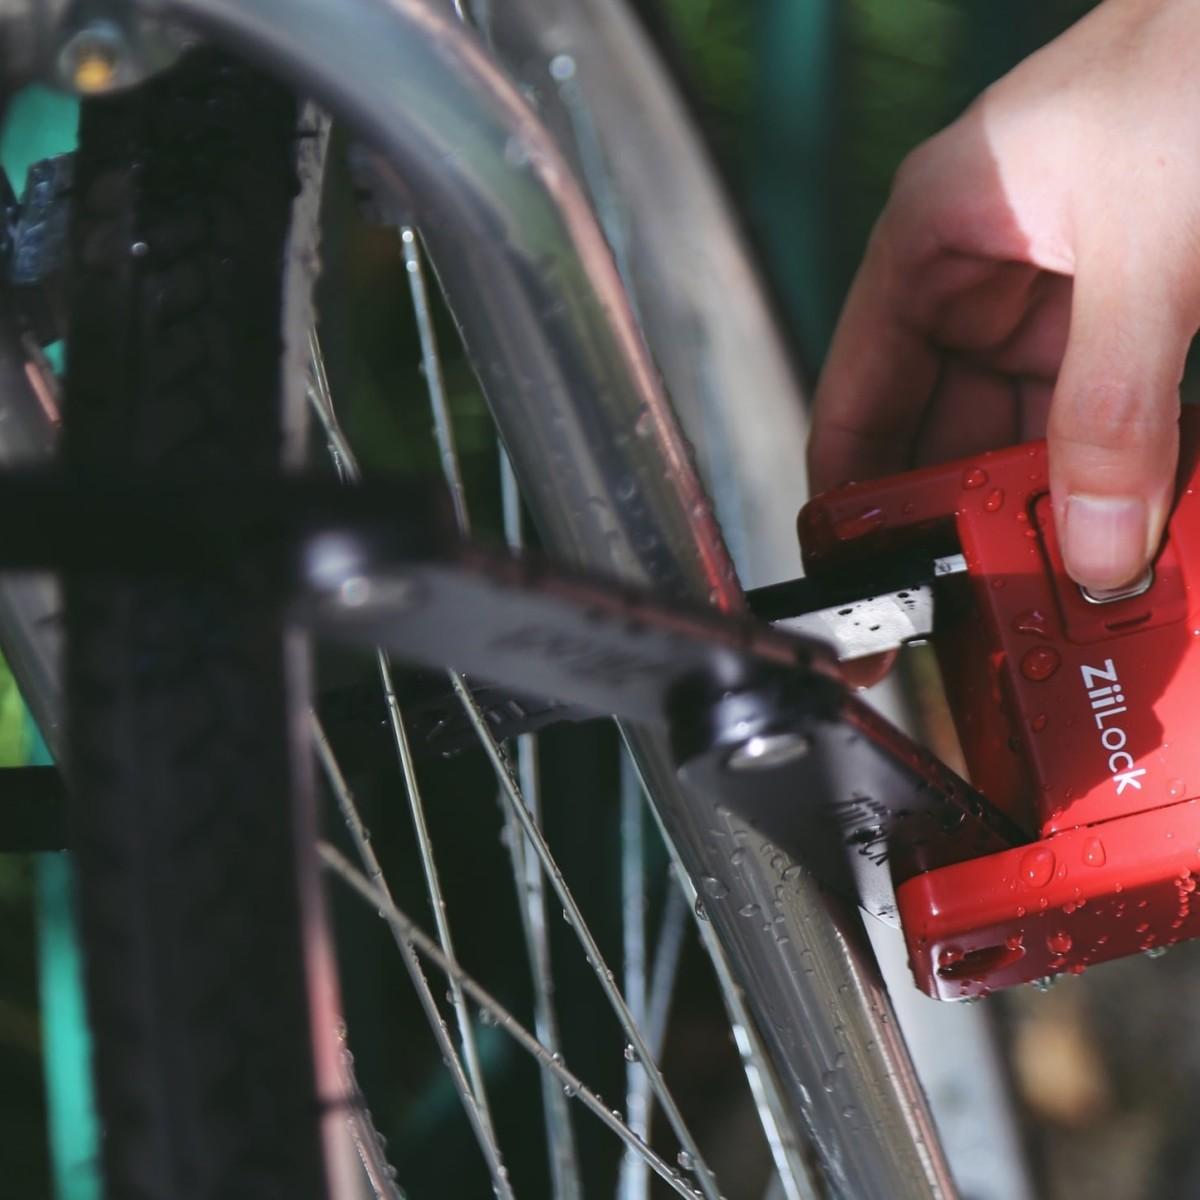 ZiiLock Foldable Proactive Bike Lock offers all-around active security